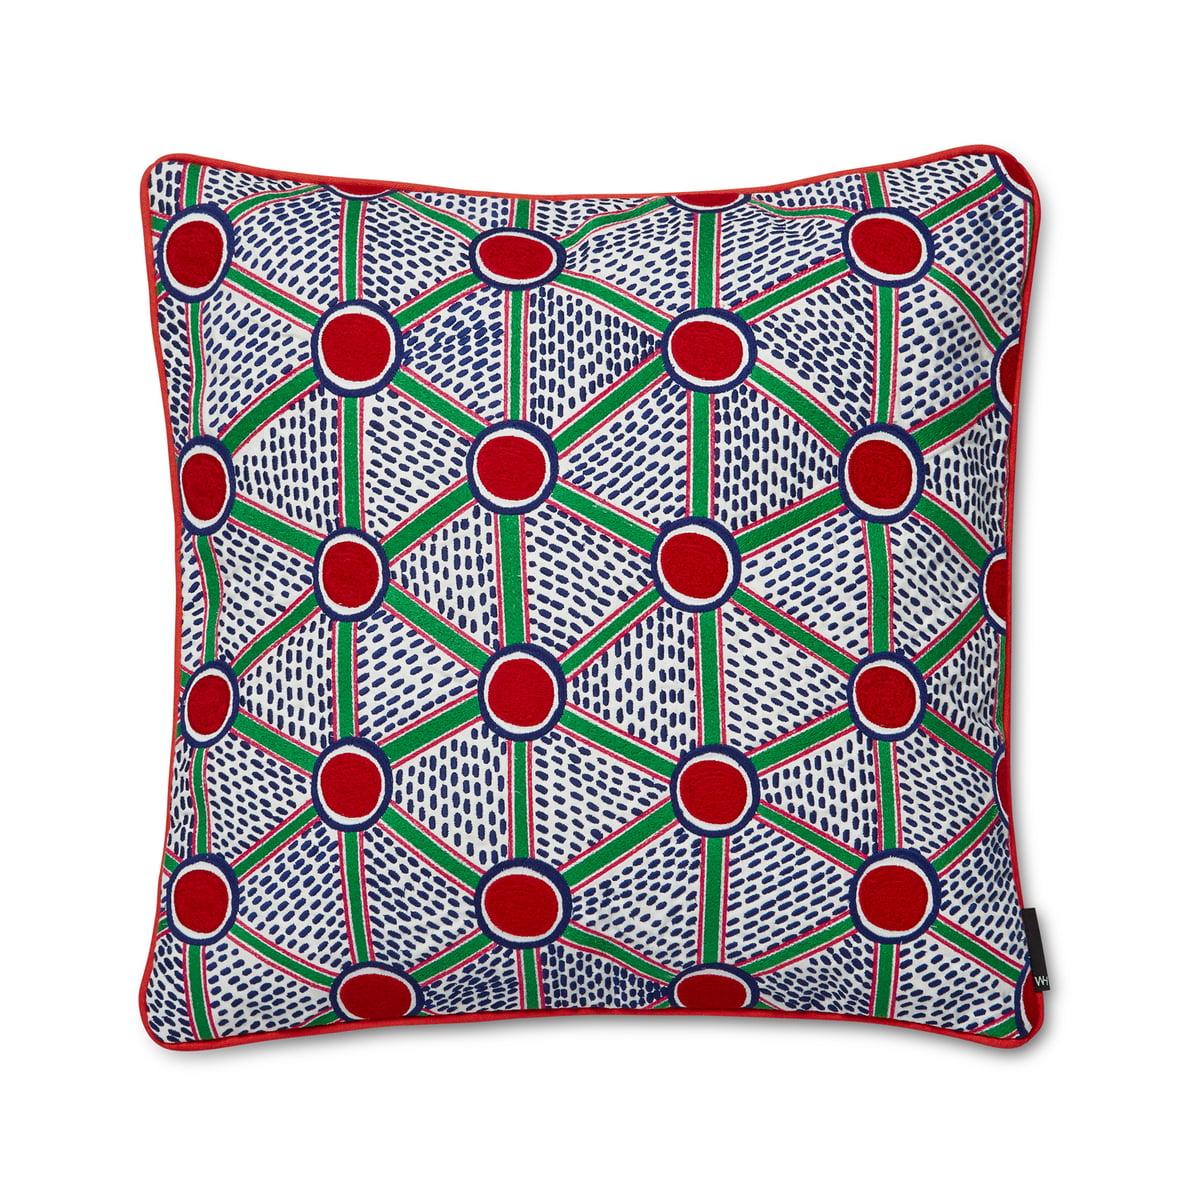 cells kissen von hay connox shop online. Black Bedroom Furniture Sets. Home Design Ideas